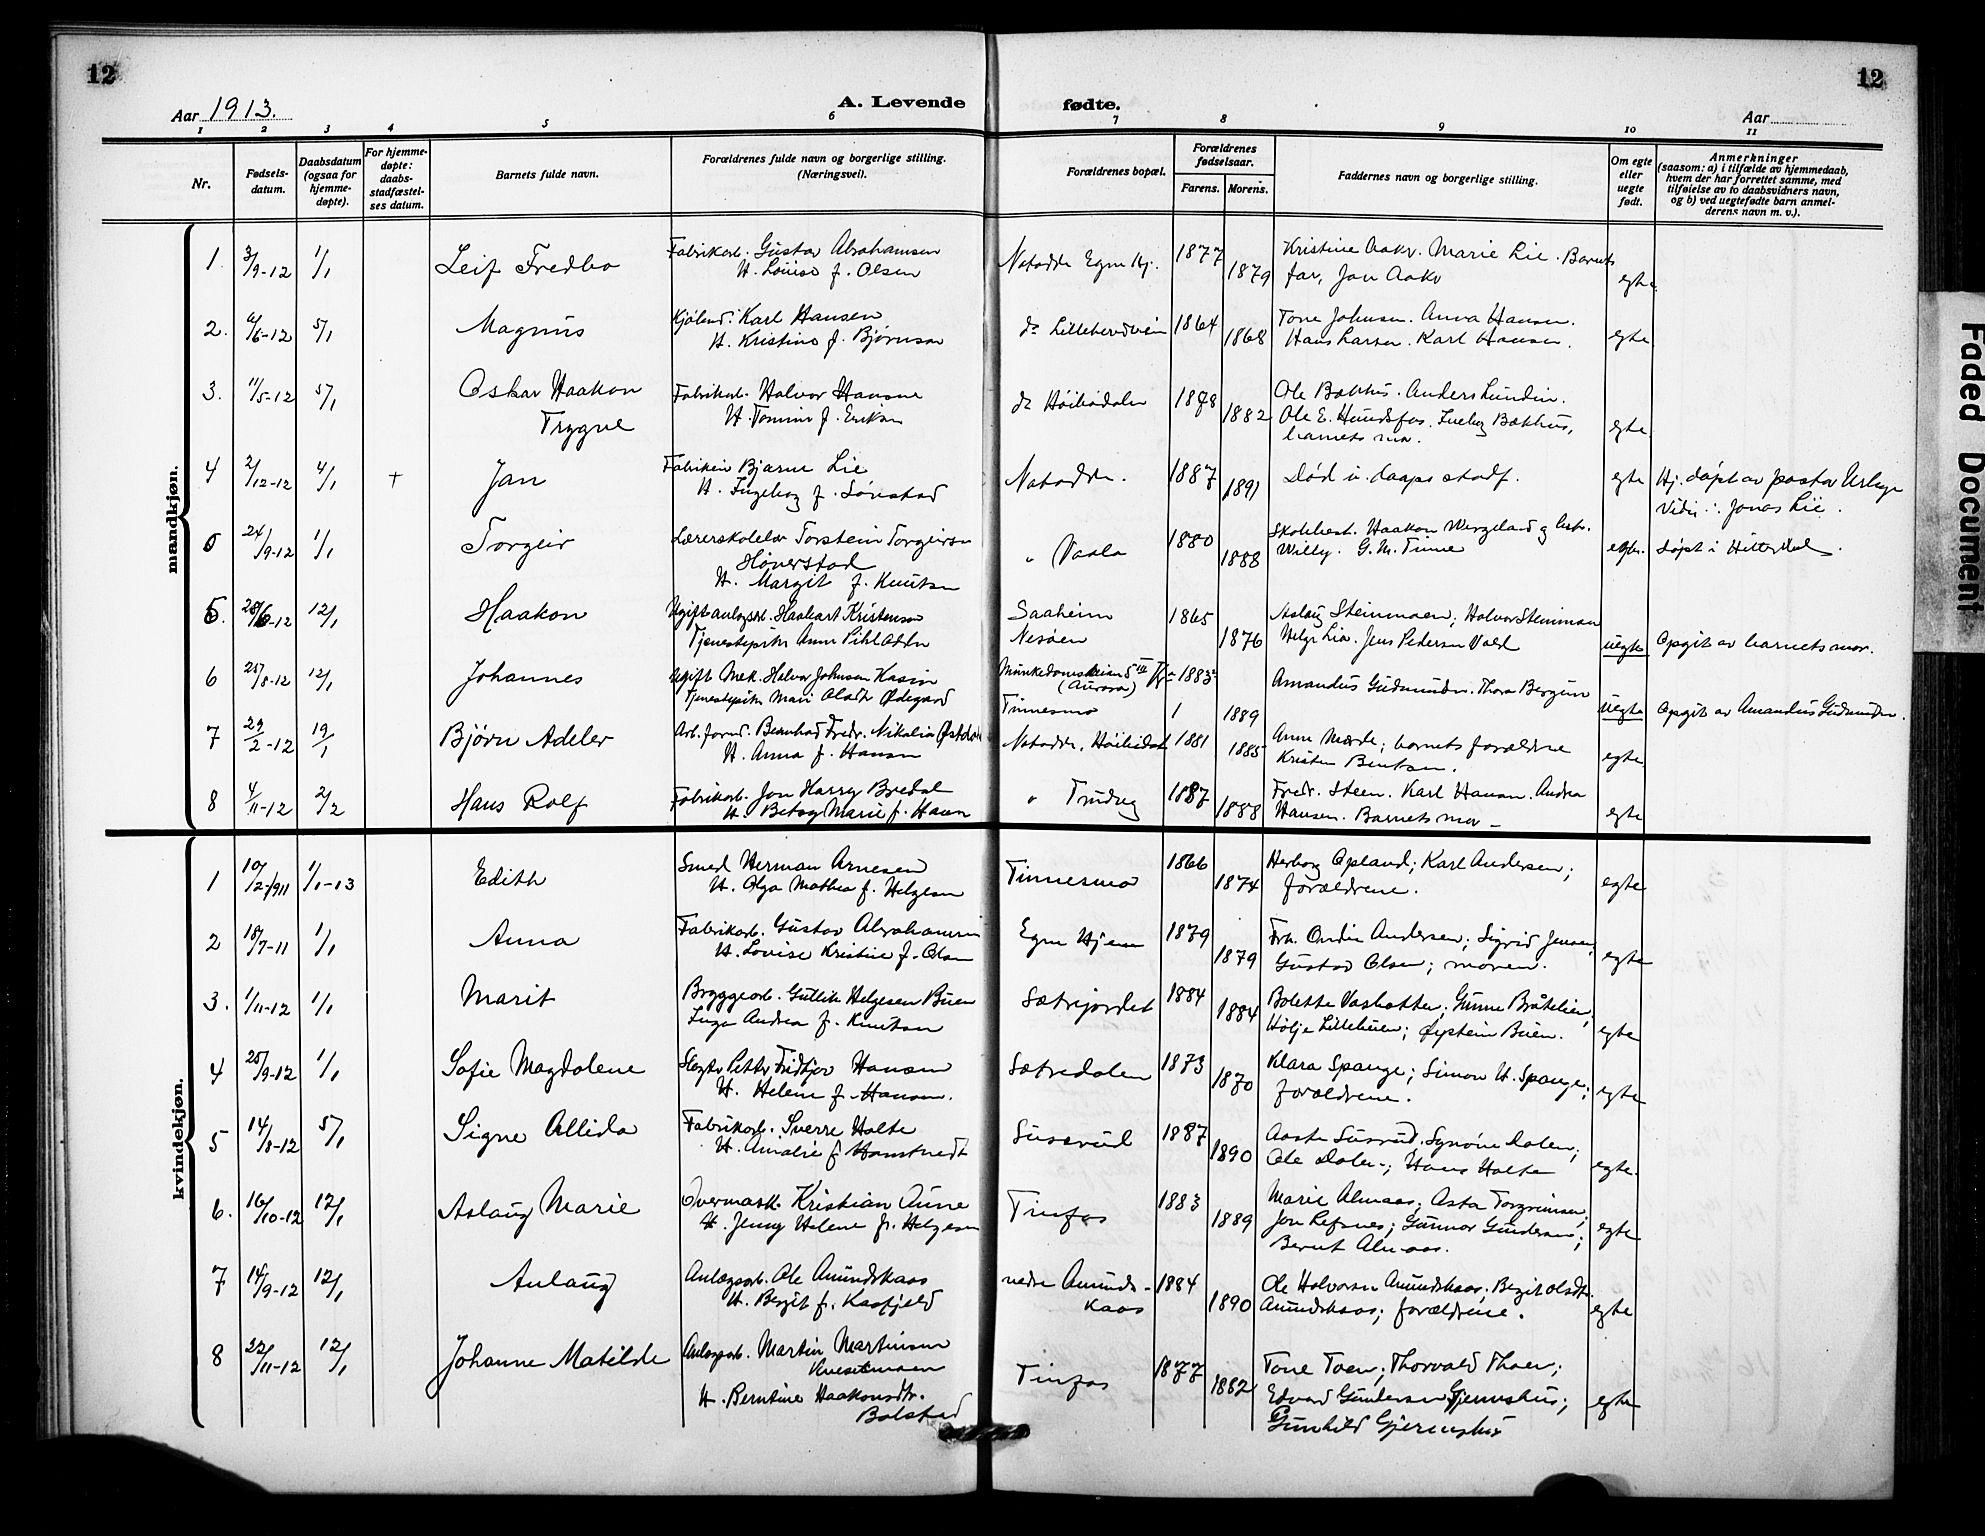 SAKO, Notodden kirkebøker, G/Ga/L0001: Klokkerbok nr. 1, 1912-1923, s. 12